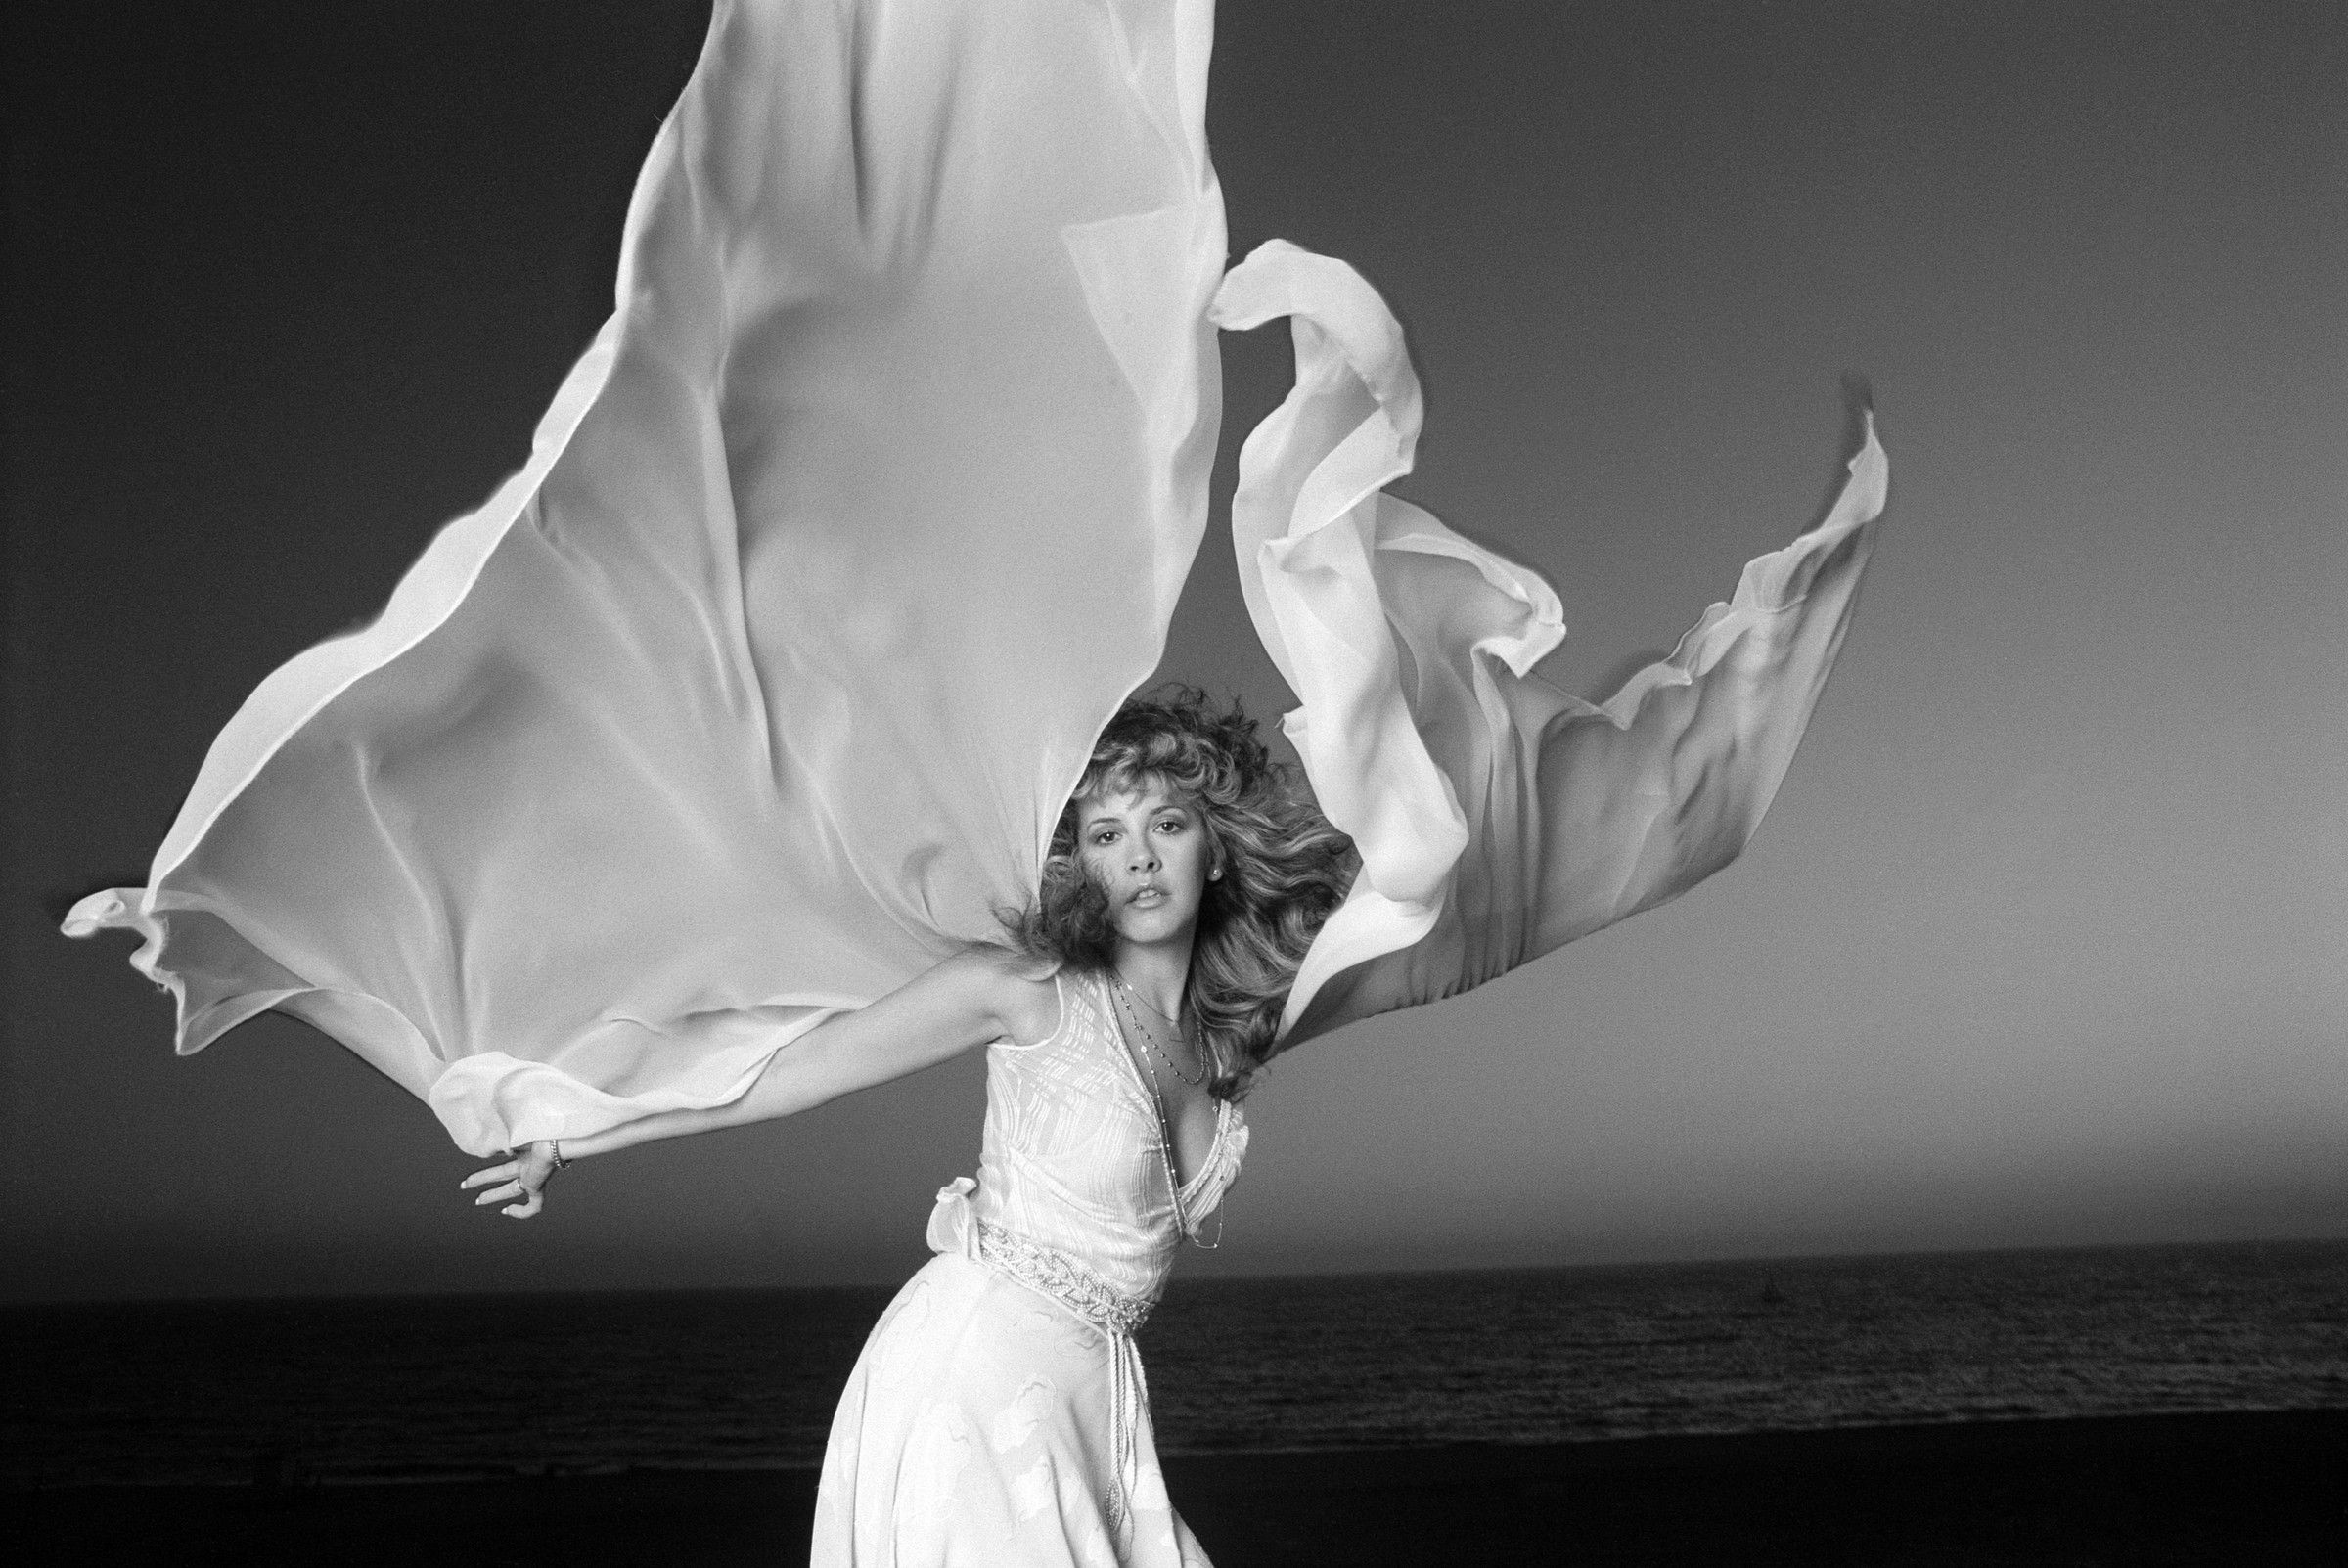 Hellogiggles A Positive Community For Women Stevie Nicks Stevie Nicks Style Stevie Nicks Fleetwood Mac [ 1603 x 2400 Pixel ]